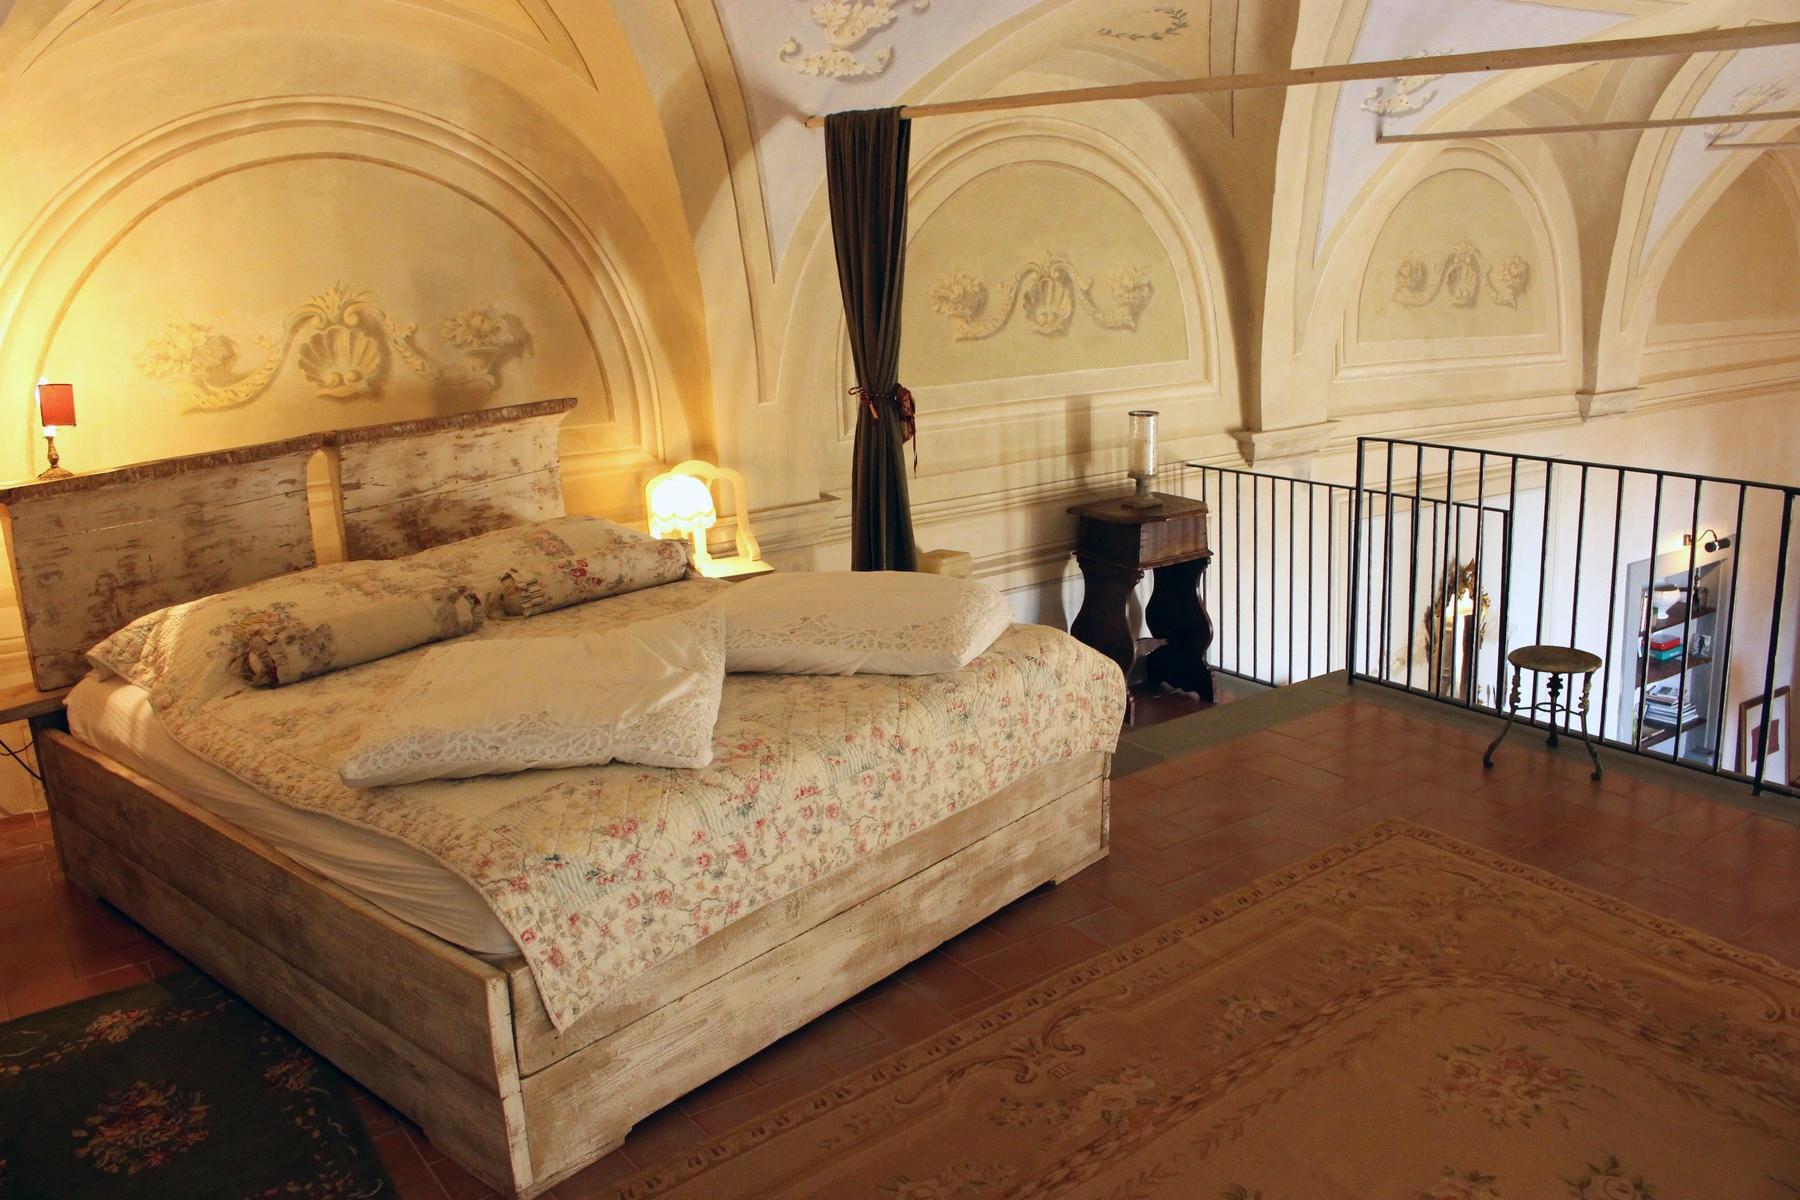 Appartamento in Vendita a San Casciano In Val Di Pesa: 4 locali, 85 mq - Foto 4